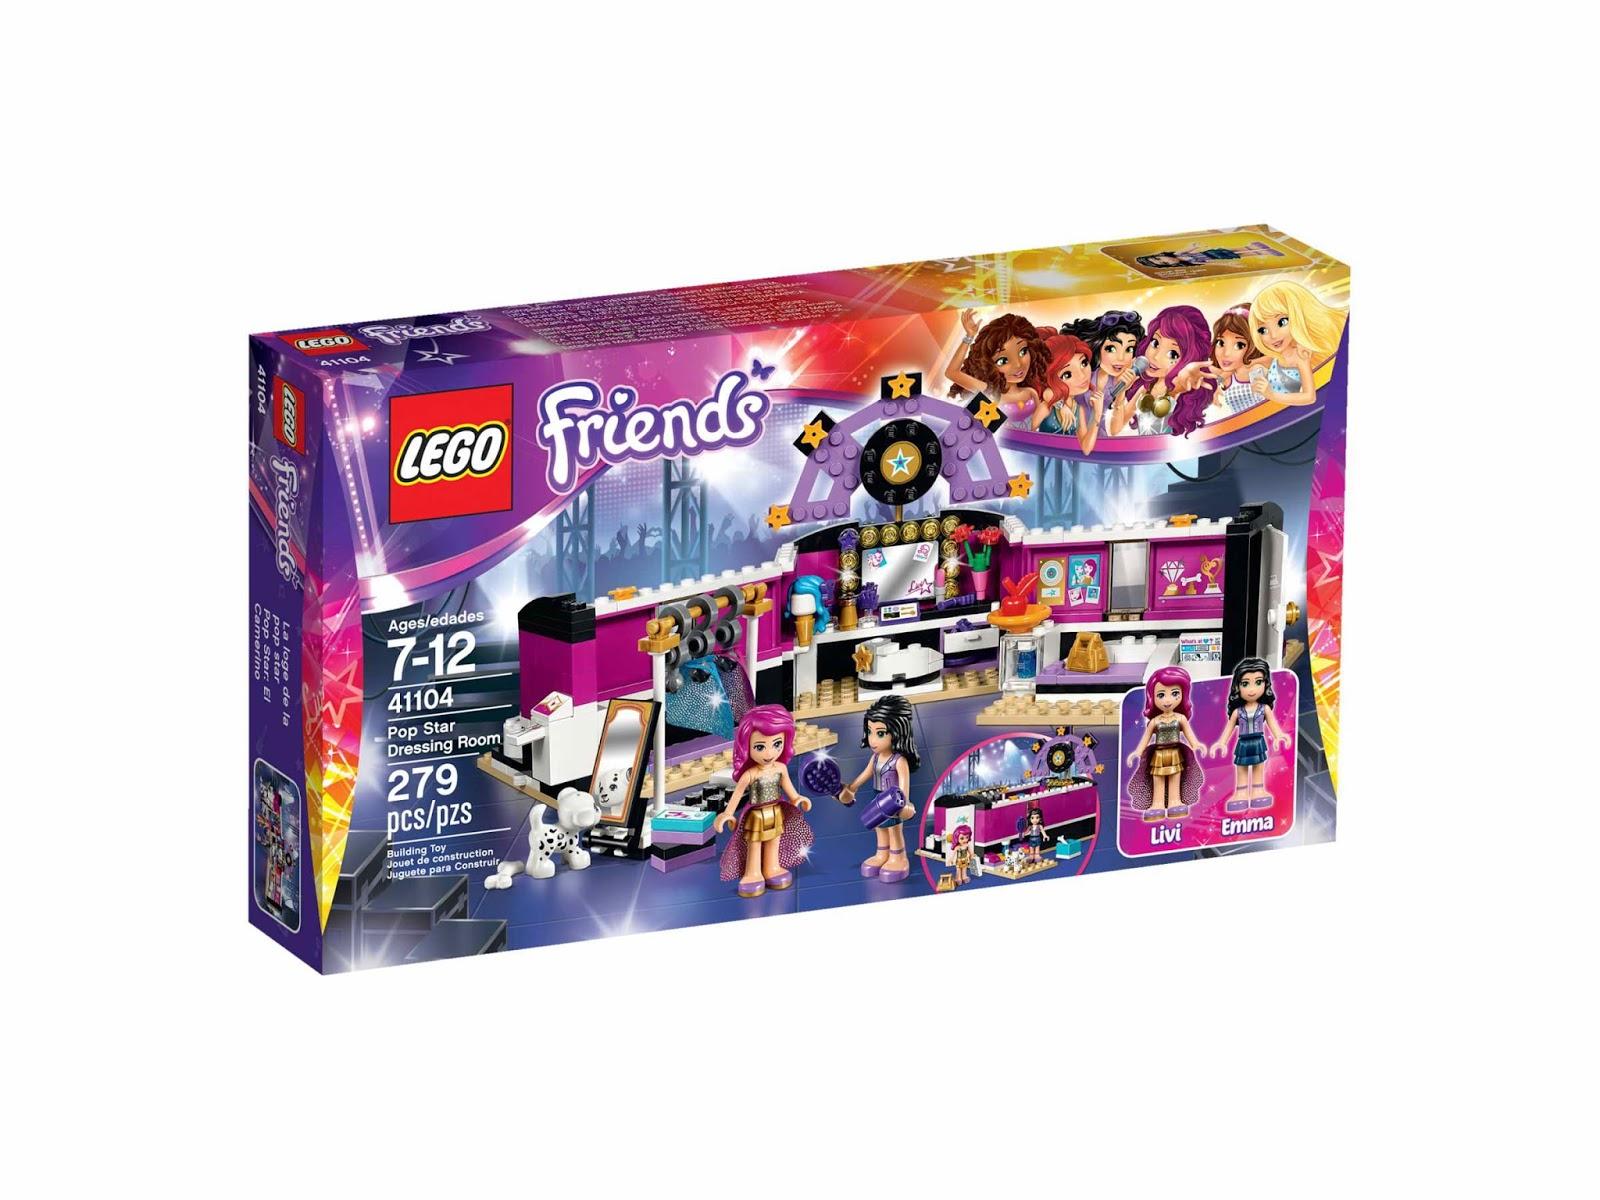 Brick Friends: LEGO 41104 Pop Star Dressing Room